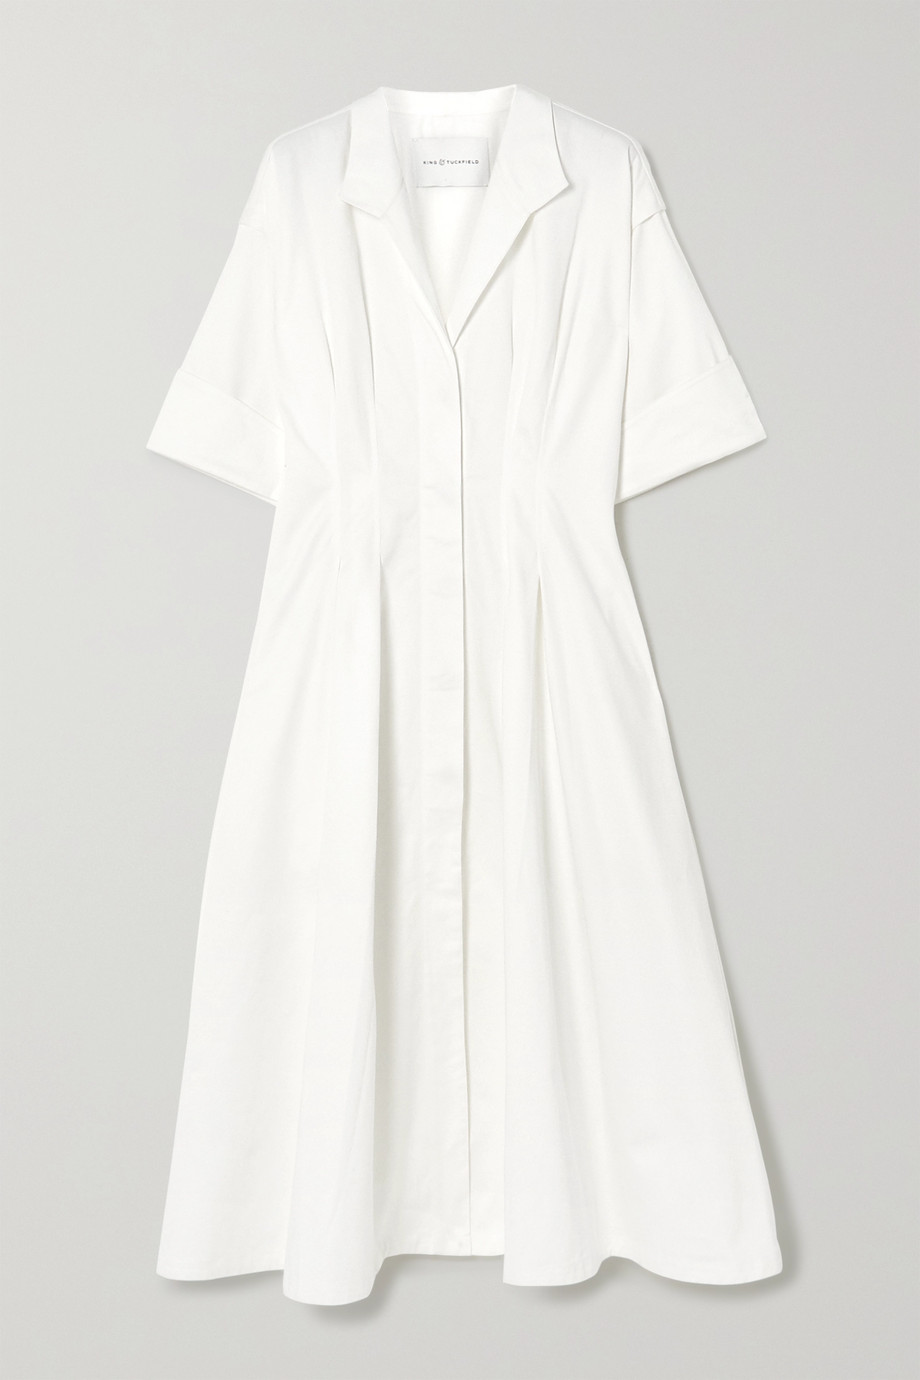 King & Tuckfield Hemdblusenkleid aus Baumwolle mit Falten